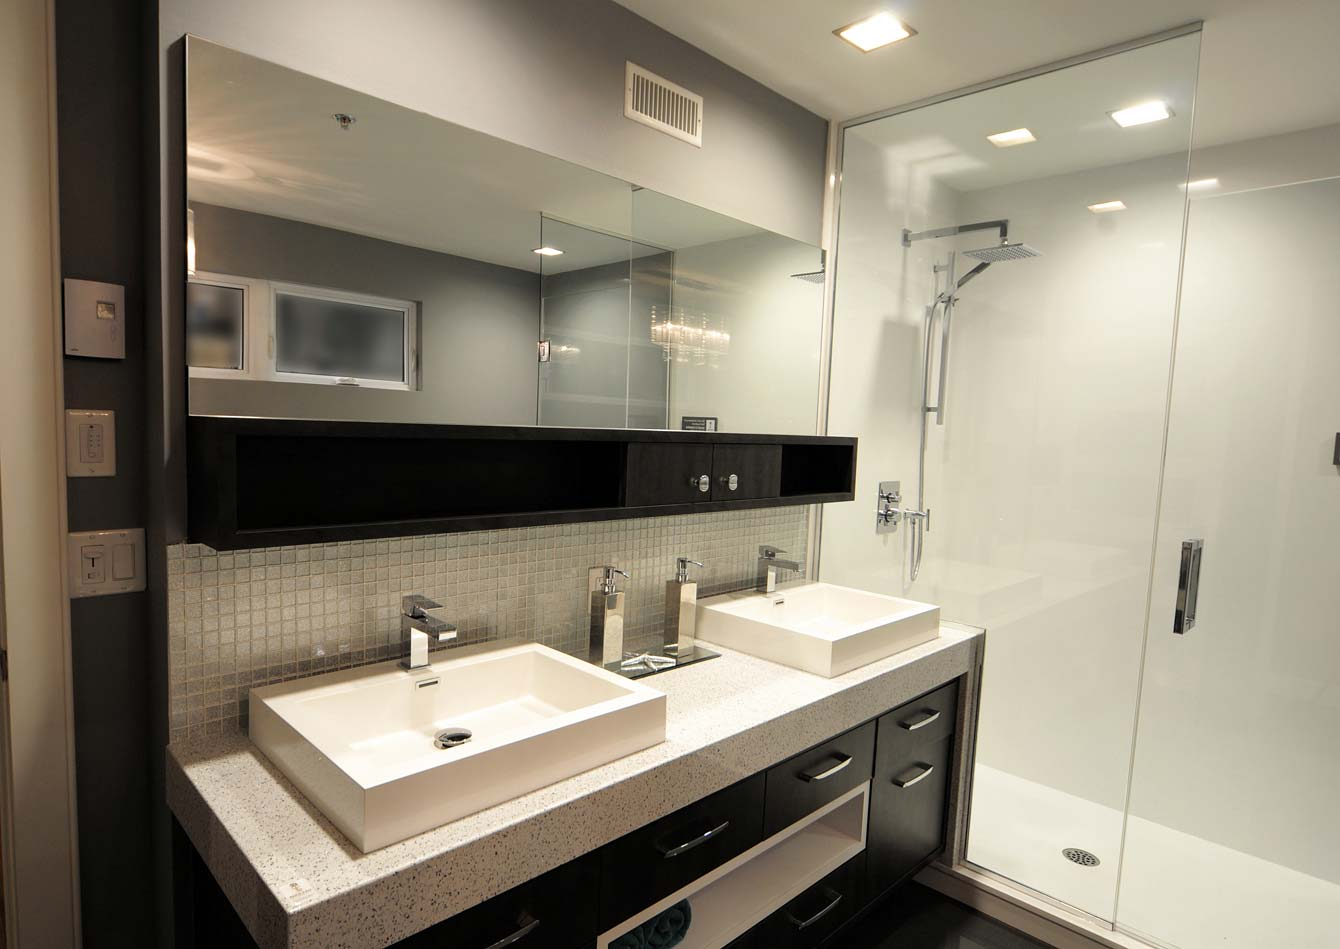 Rouleau granit - Sink